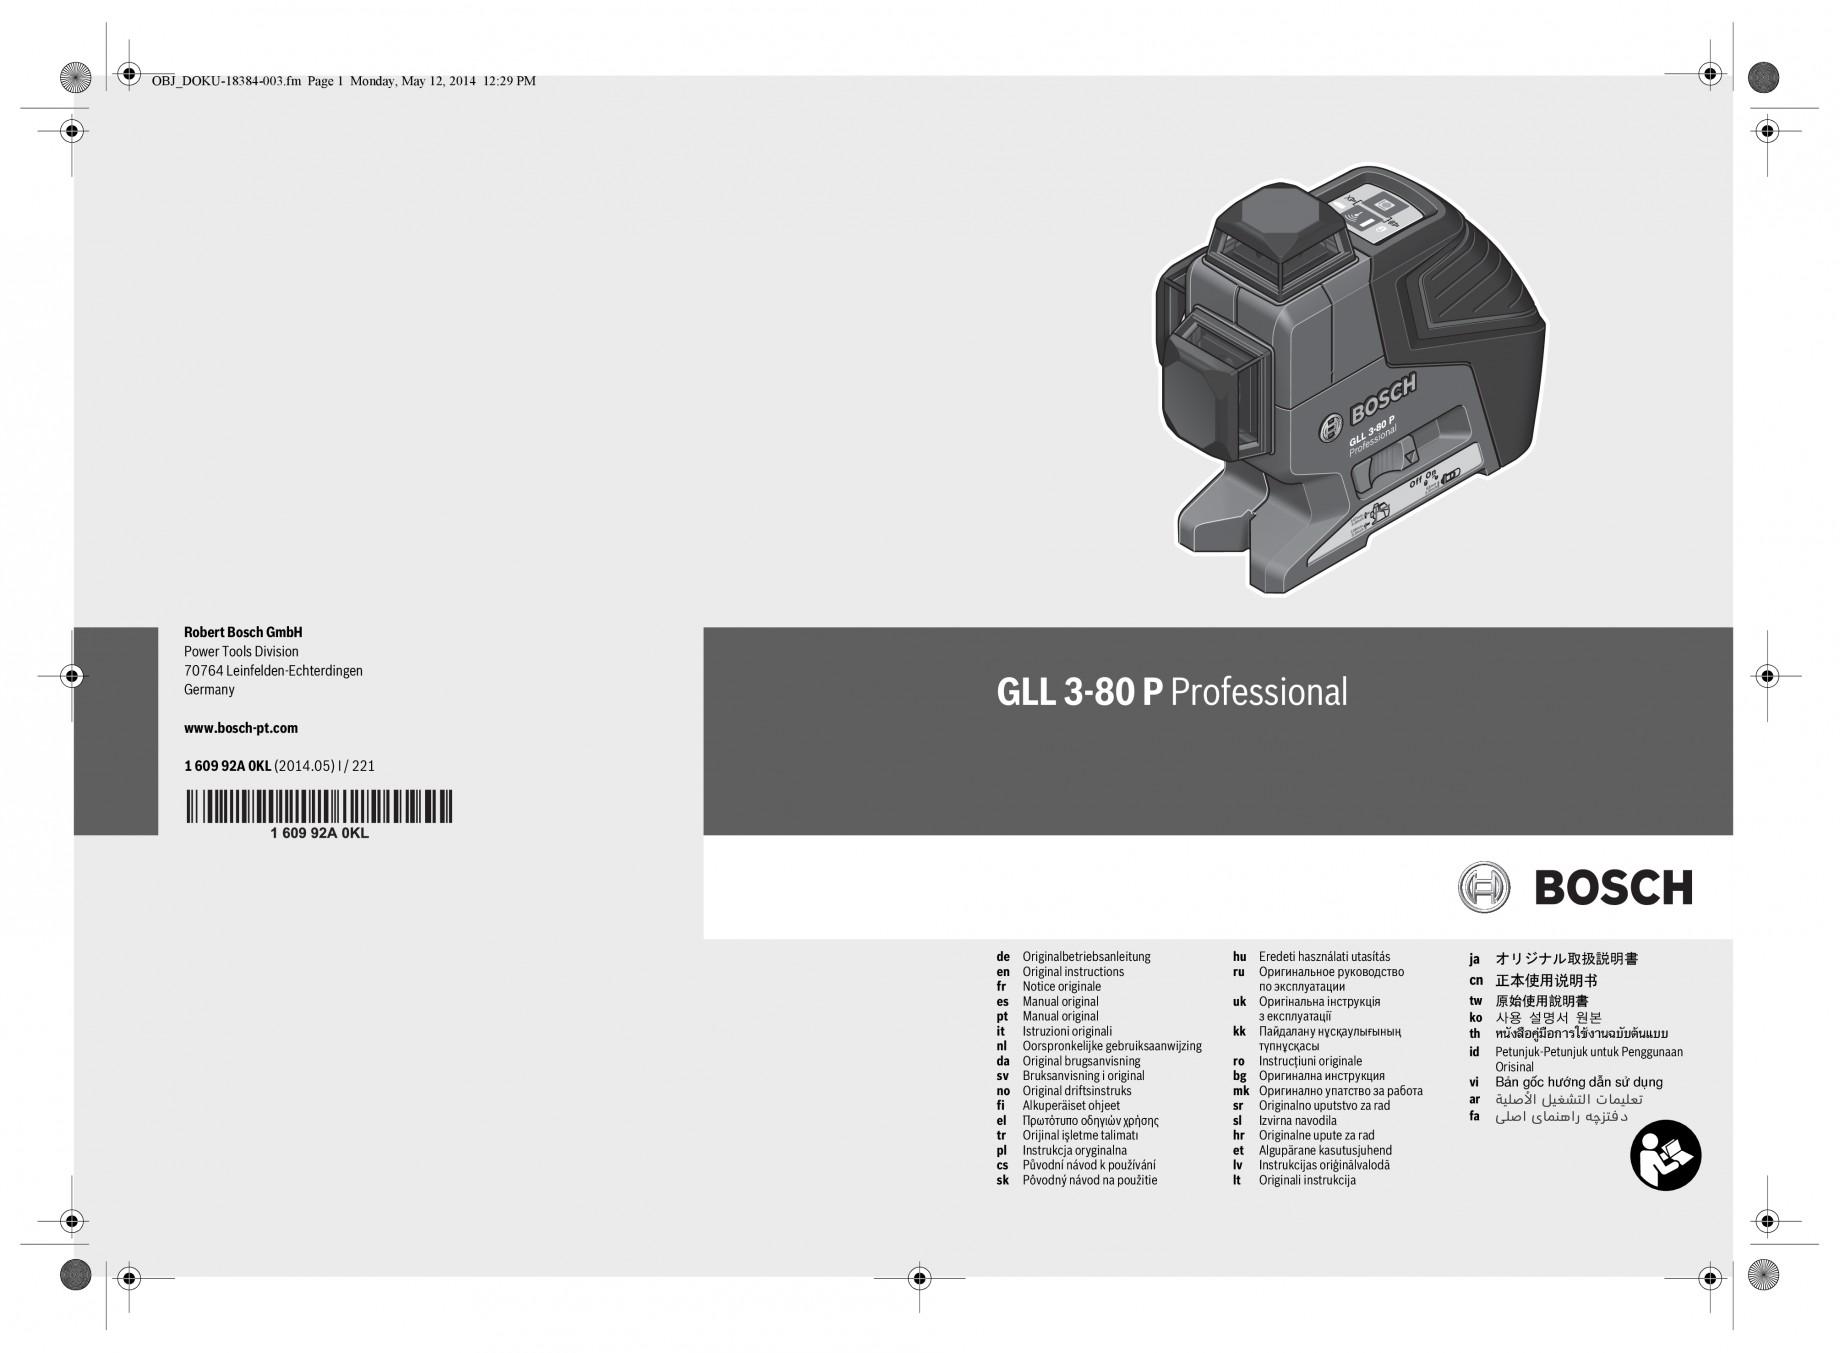 fisa tehnica nivela laser cu linii bm1 suport lr2 receptor l boxx bosch professional gll 3. Black Bedroom Furniture Sets. Home Design Ideas